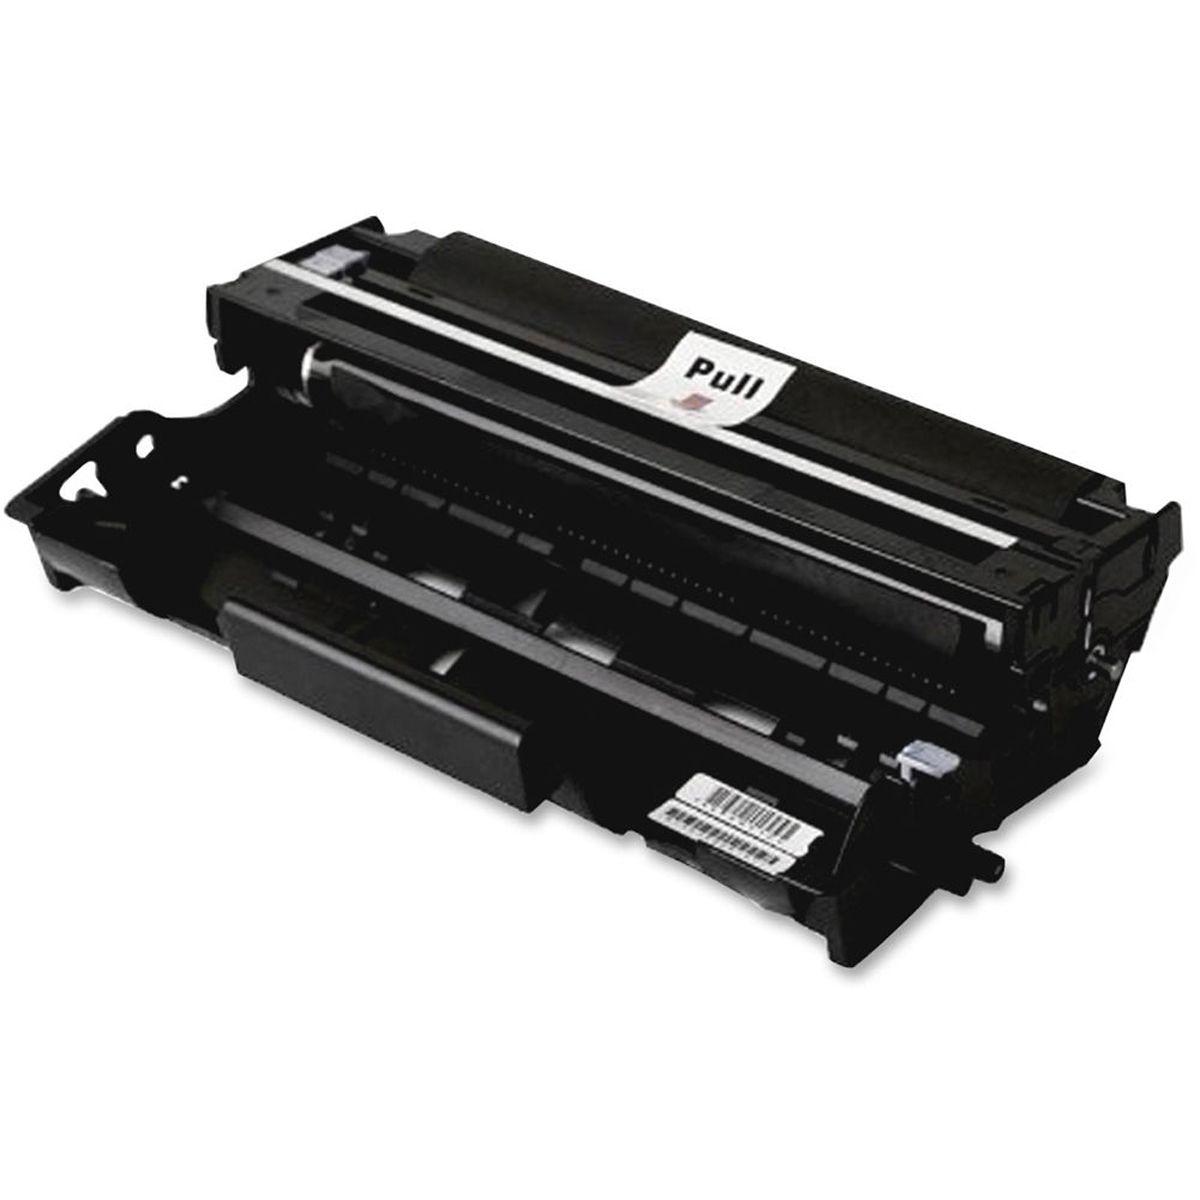 Fotocondutor DR820 DR3440 3442 - HLL5102 DCP5502 5702 5802